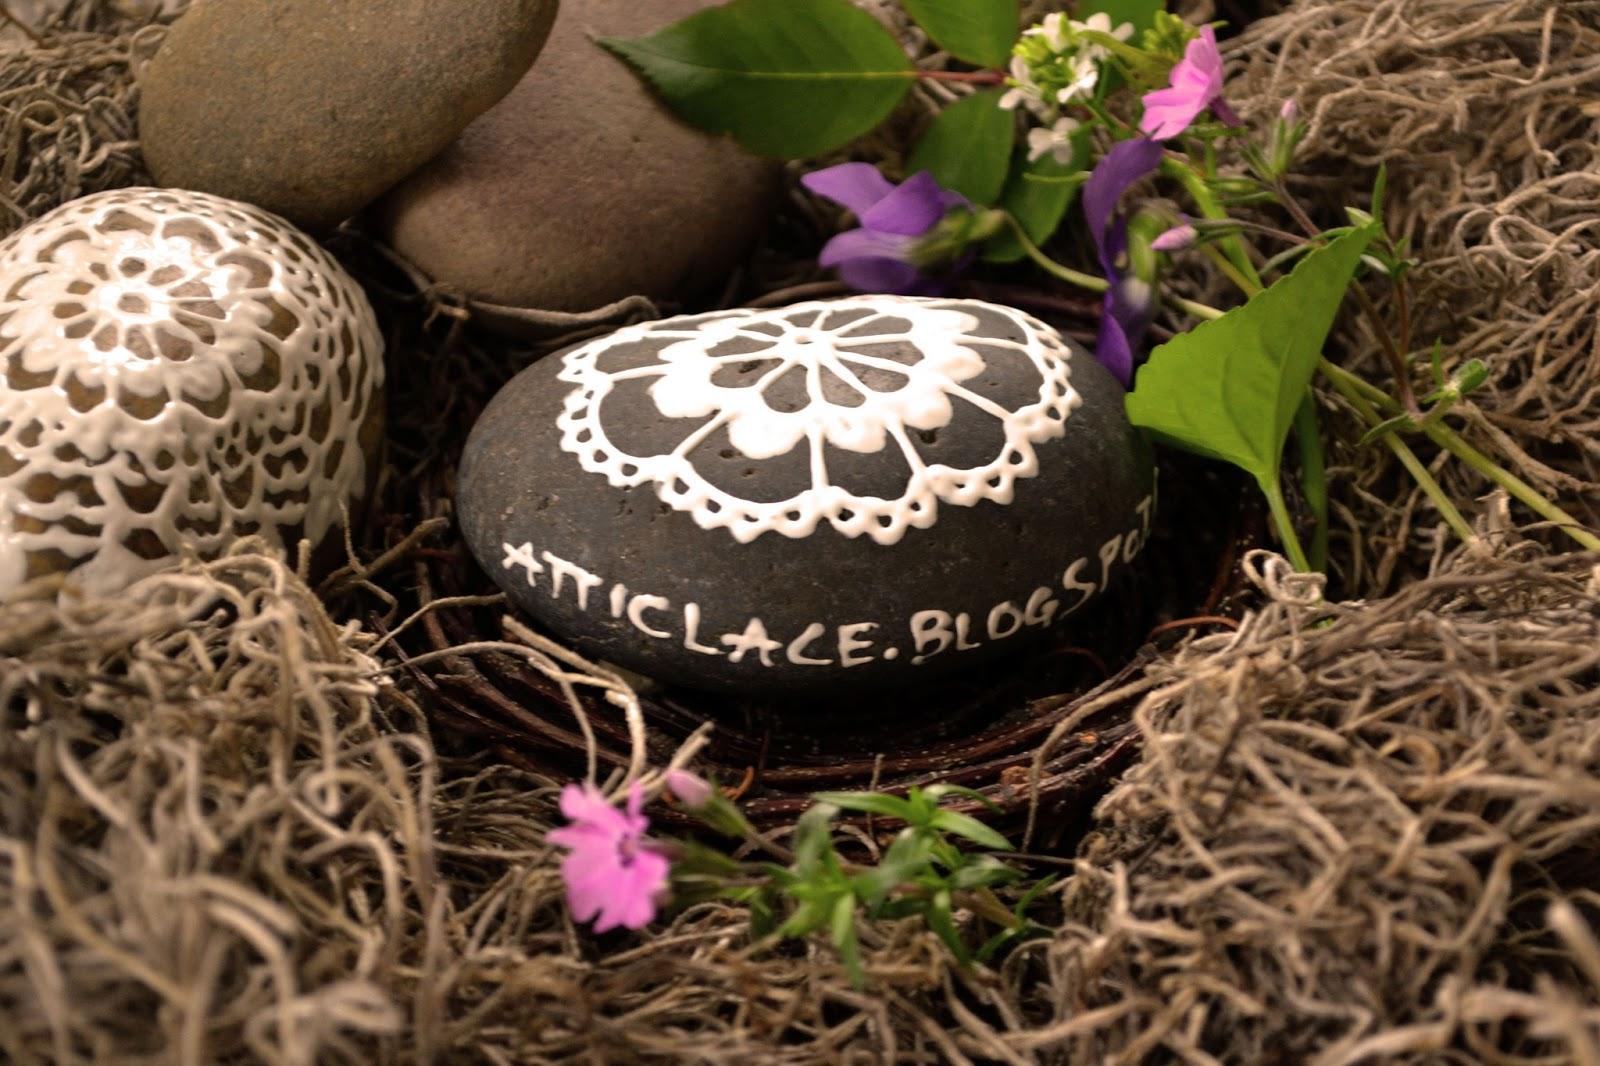 Attic Lace Project Pebble